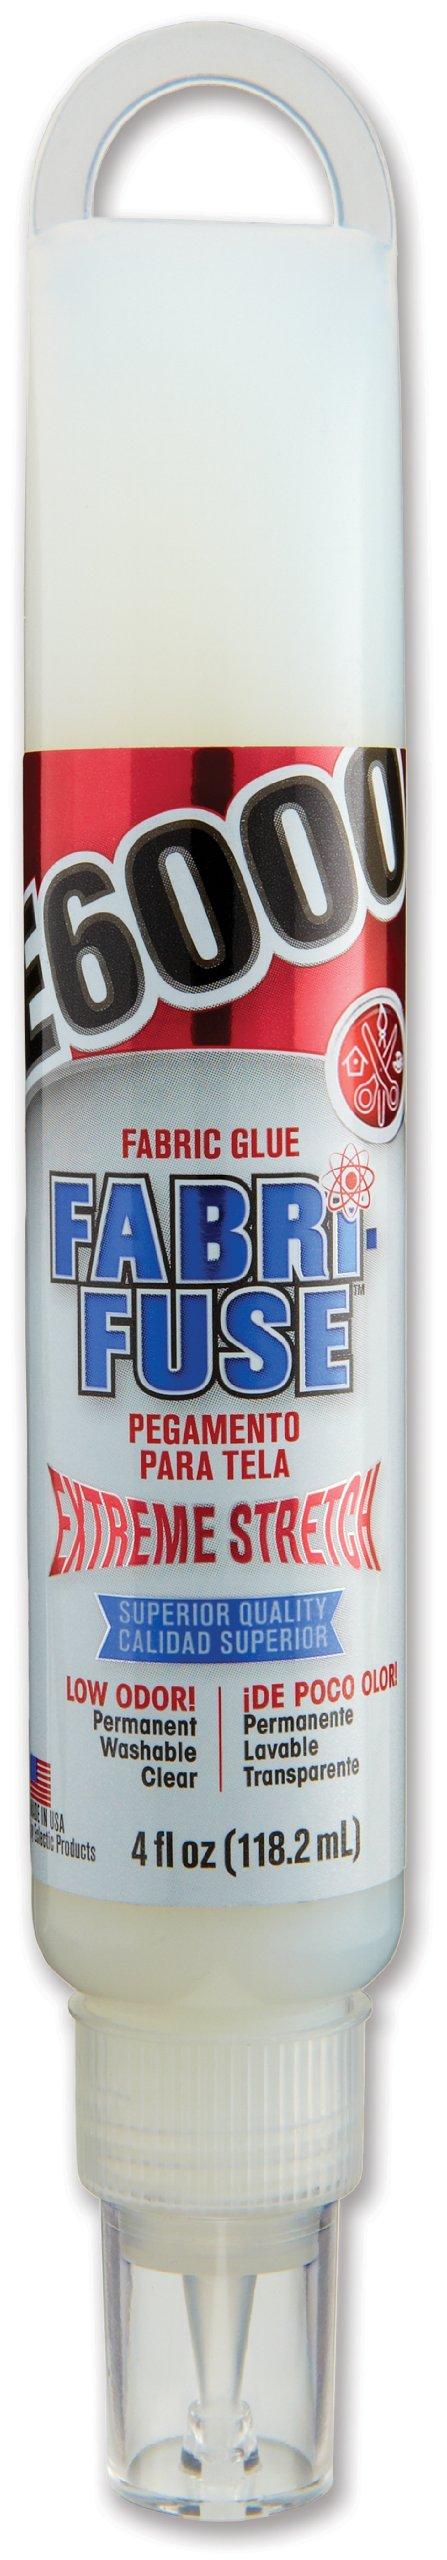 E6000 565002 Fabri-Fuse Adhesive, 4 fl oz Hang Bottle